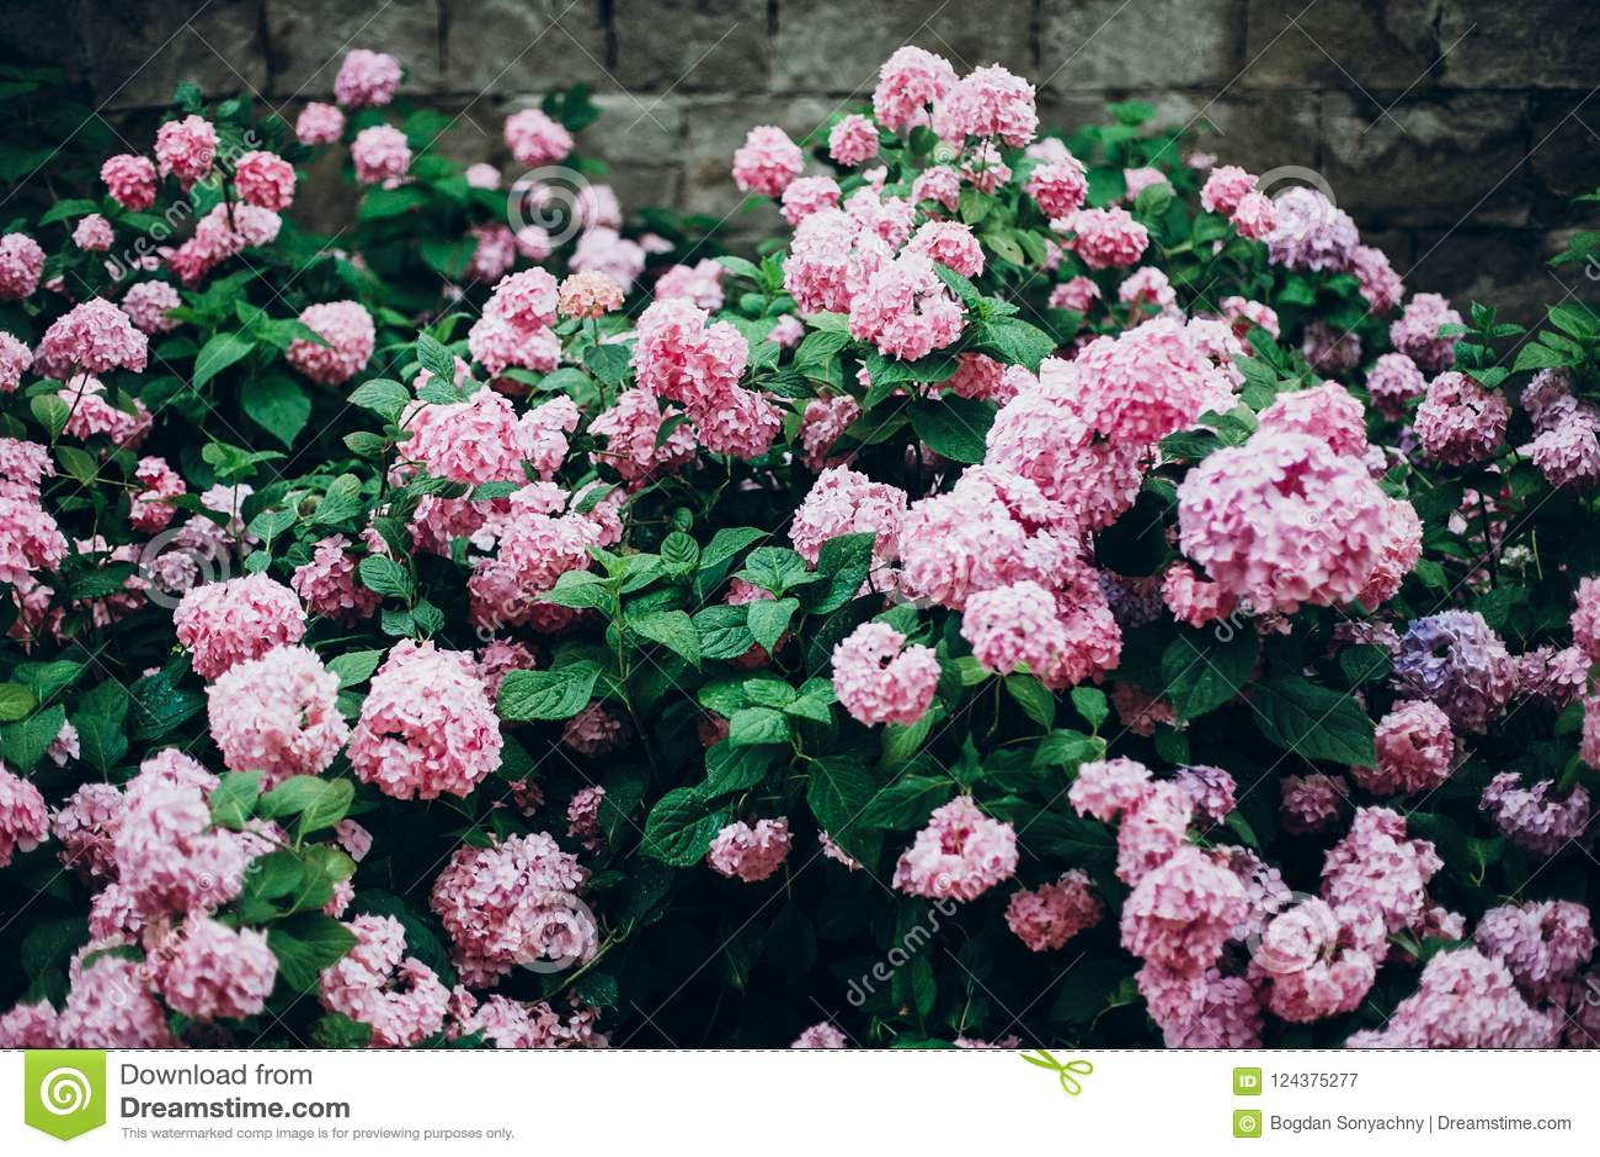 Hydrangeas Big Beautiful Hydrangea Pink Bushamazing Flowers In